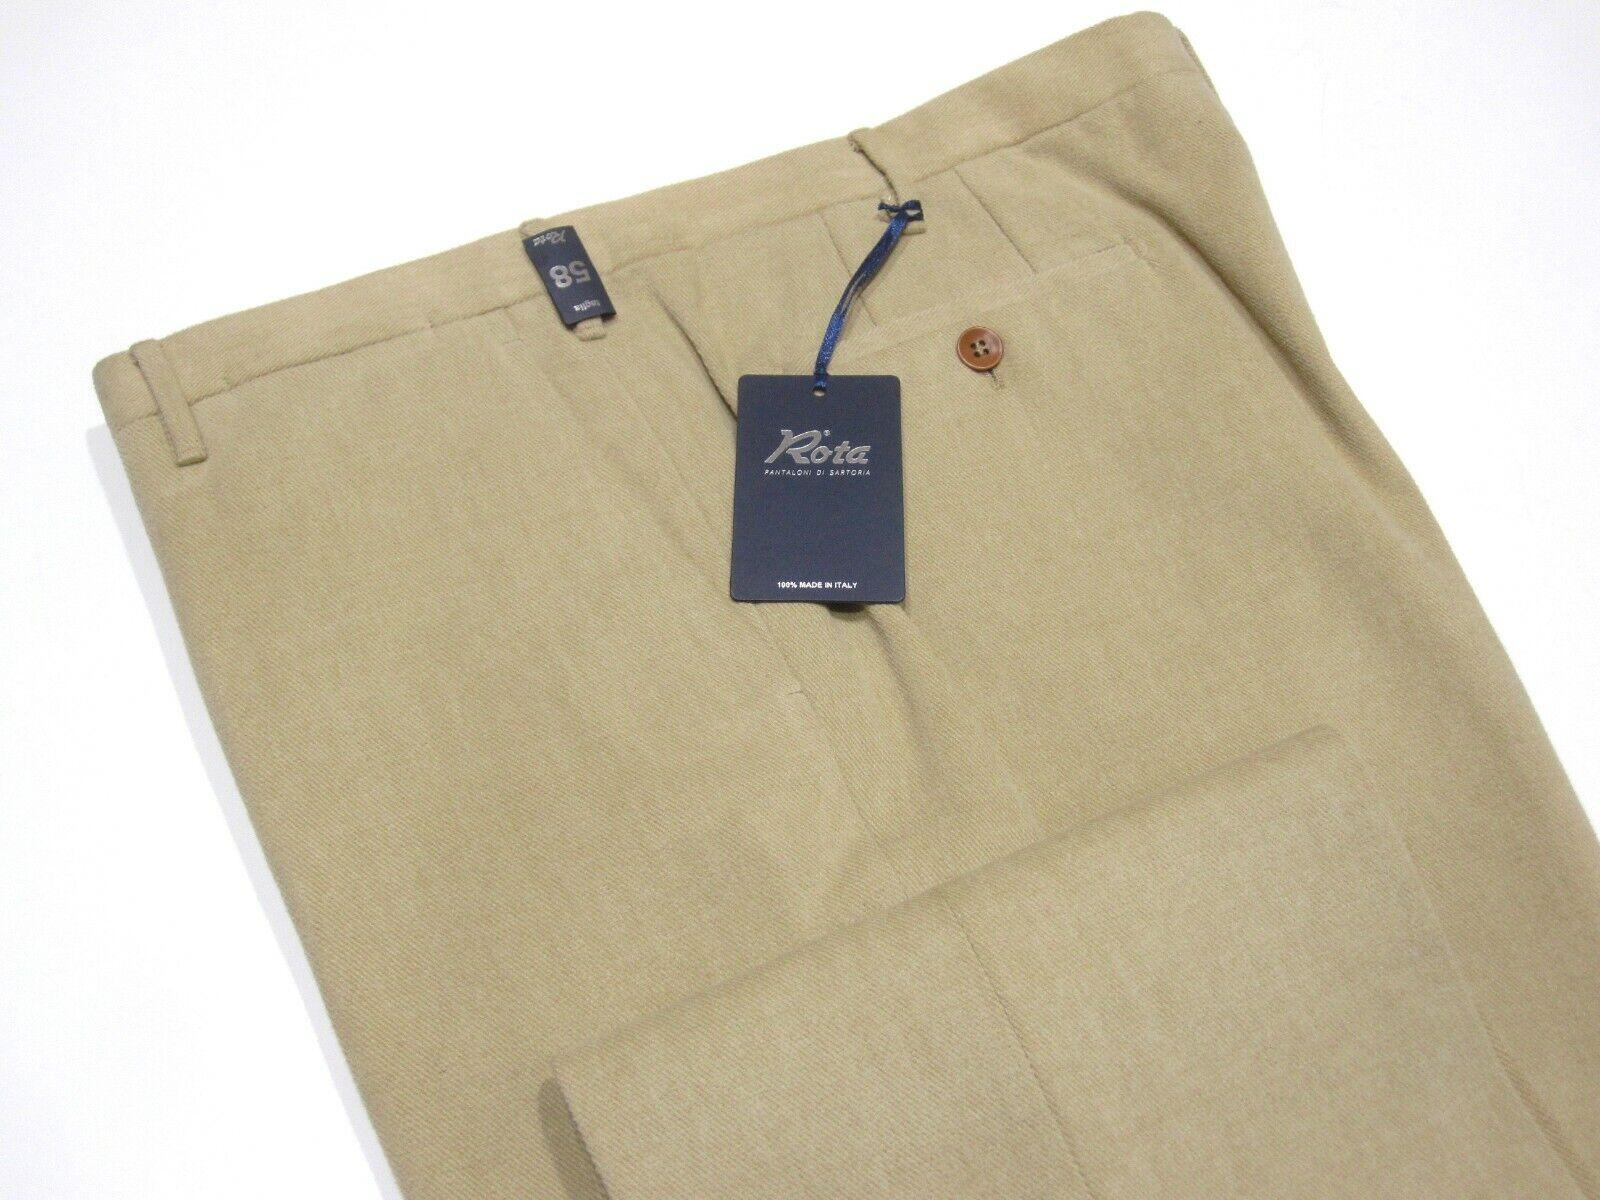 BNWT ROTA Pantaloni Tan Brushed Brushed Brushed Cotton Twill Flat Front Pants Trousers Dimensione 58 804eca